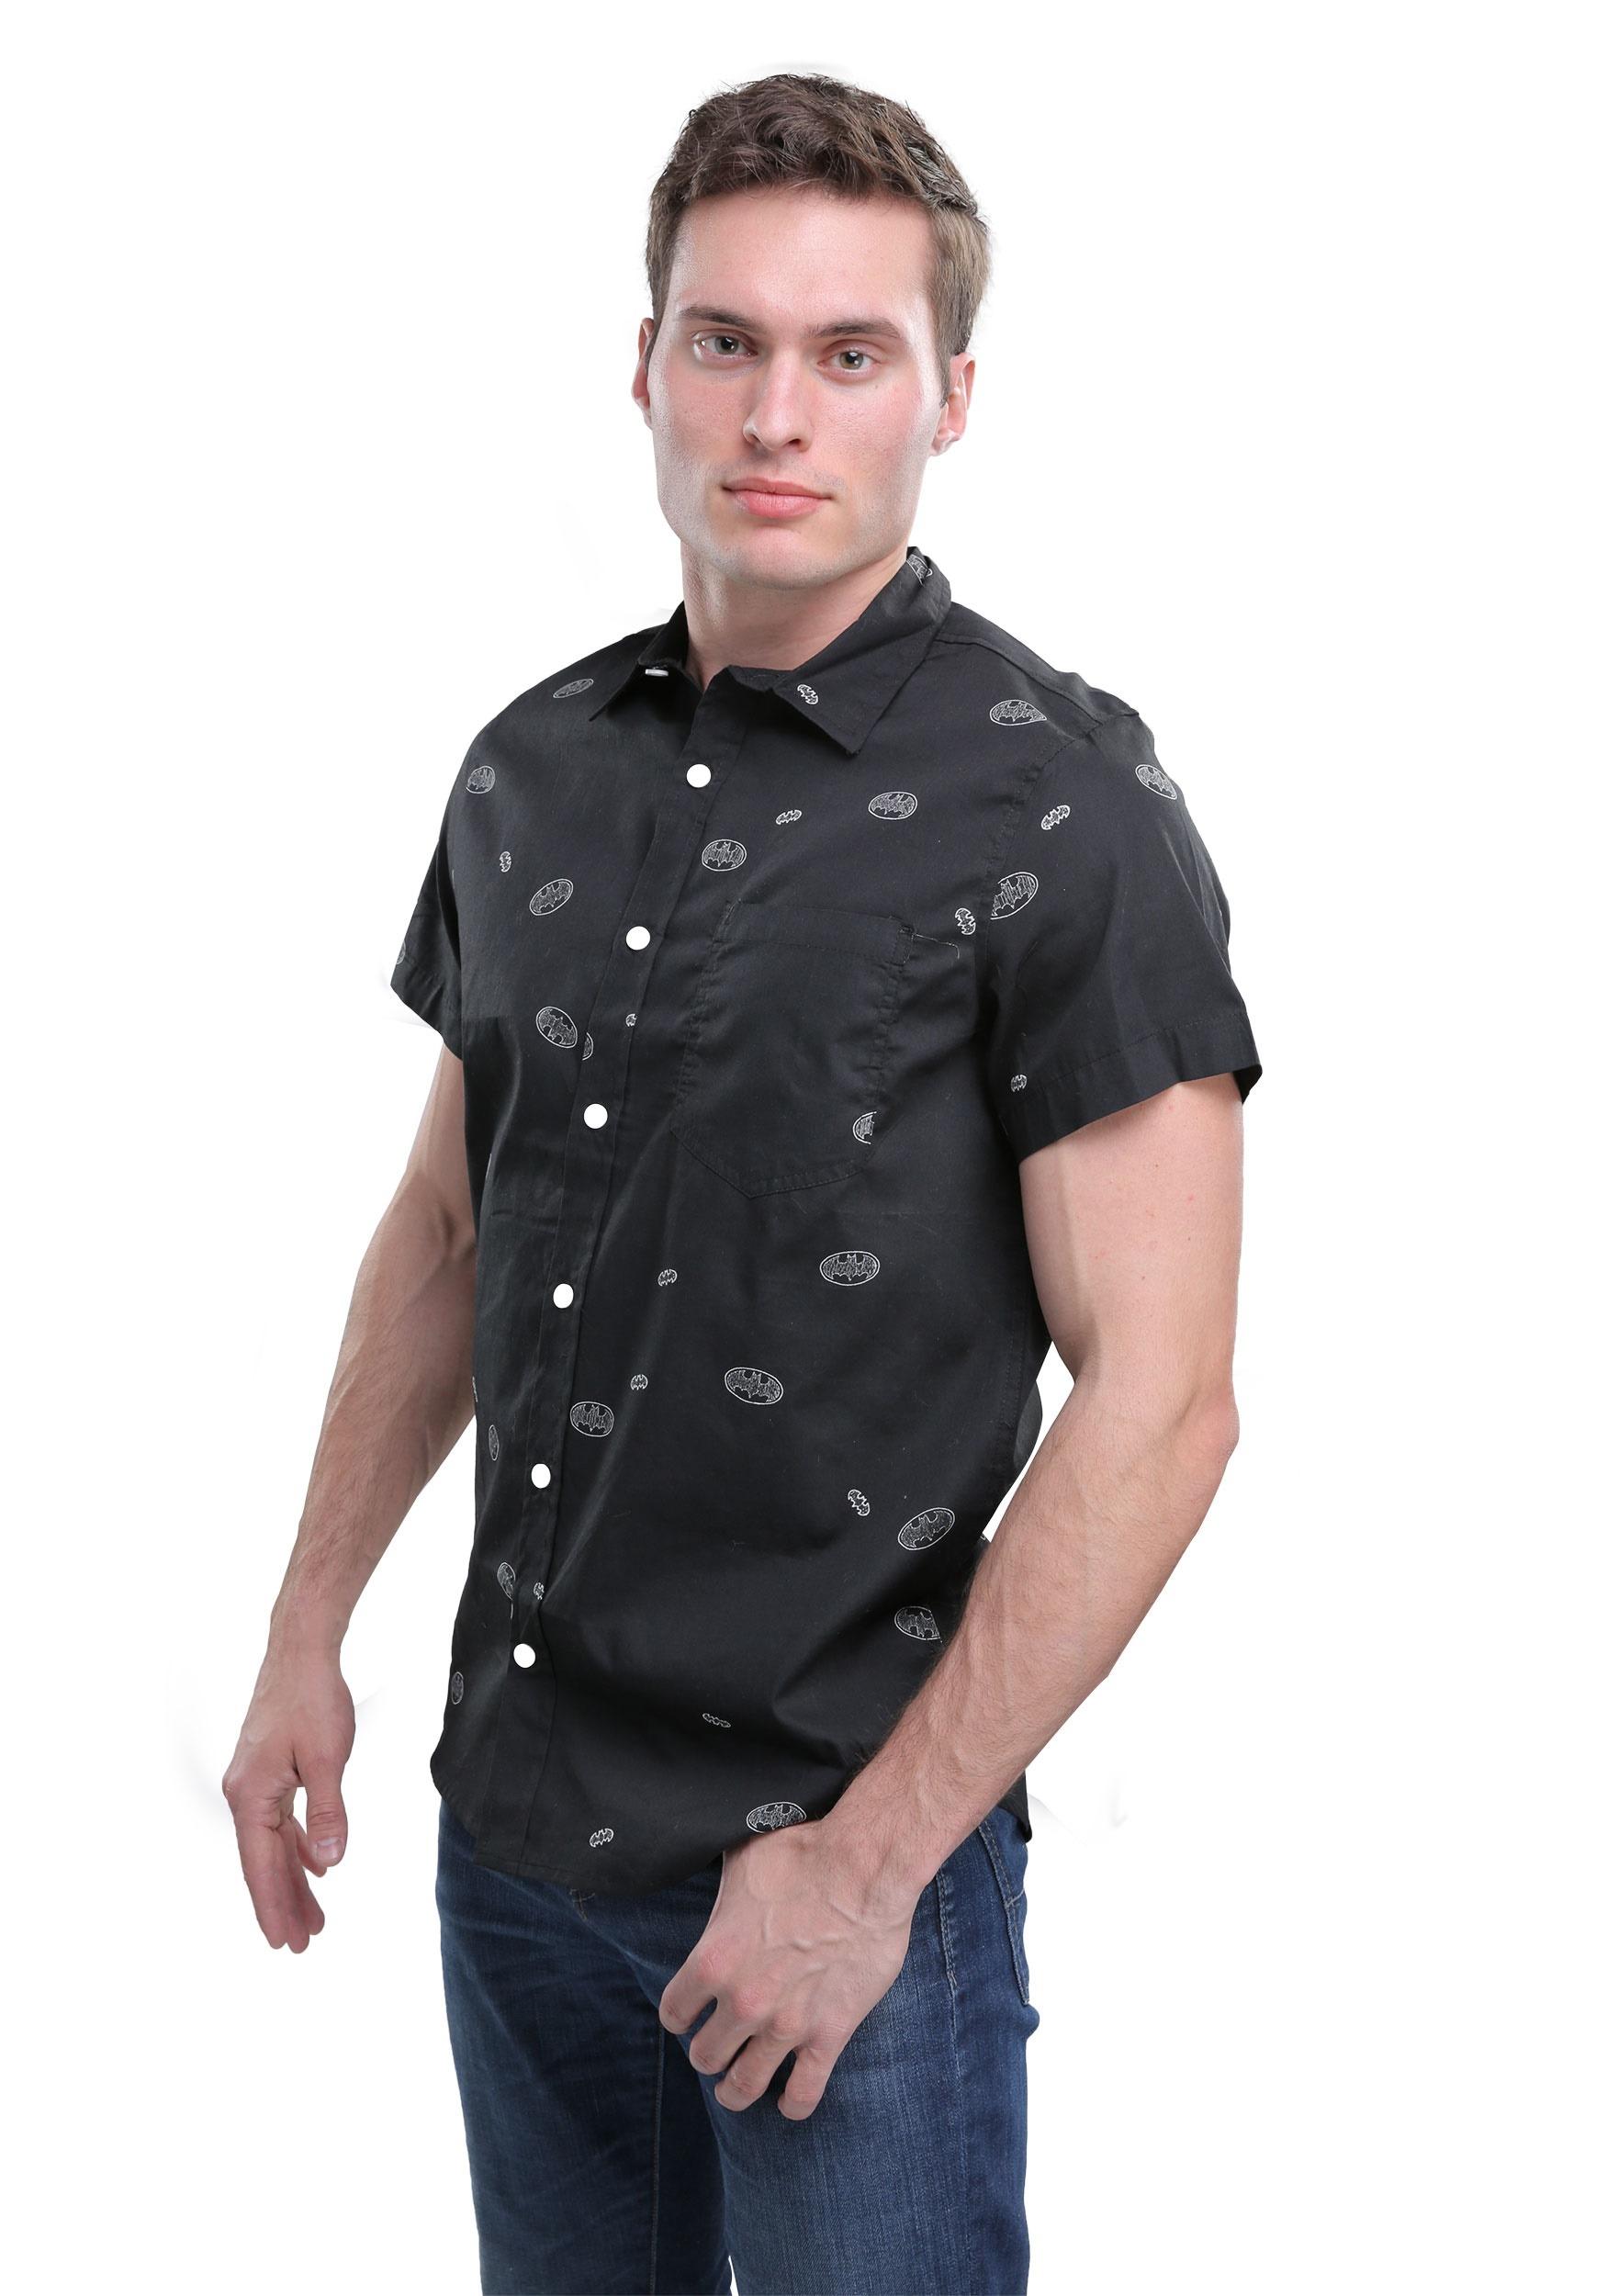 Dc comics batman woven button down shirt for men for Men s down shirt